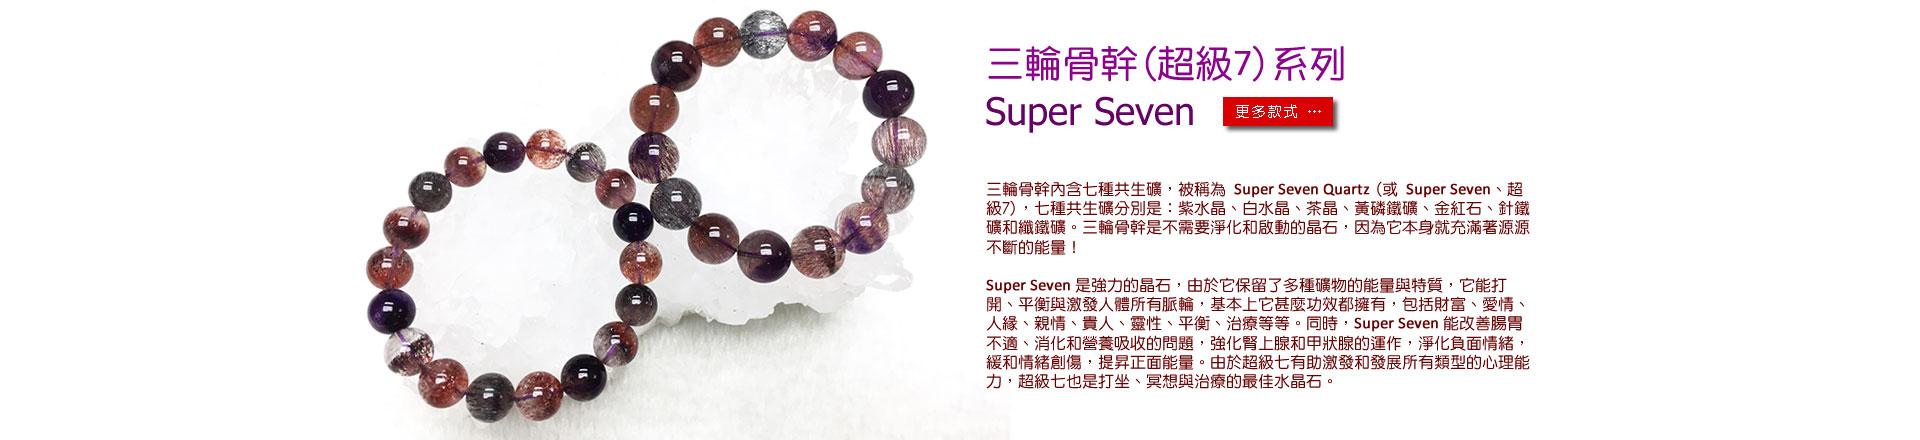 13 超級七 Super Seven